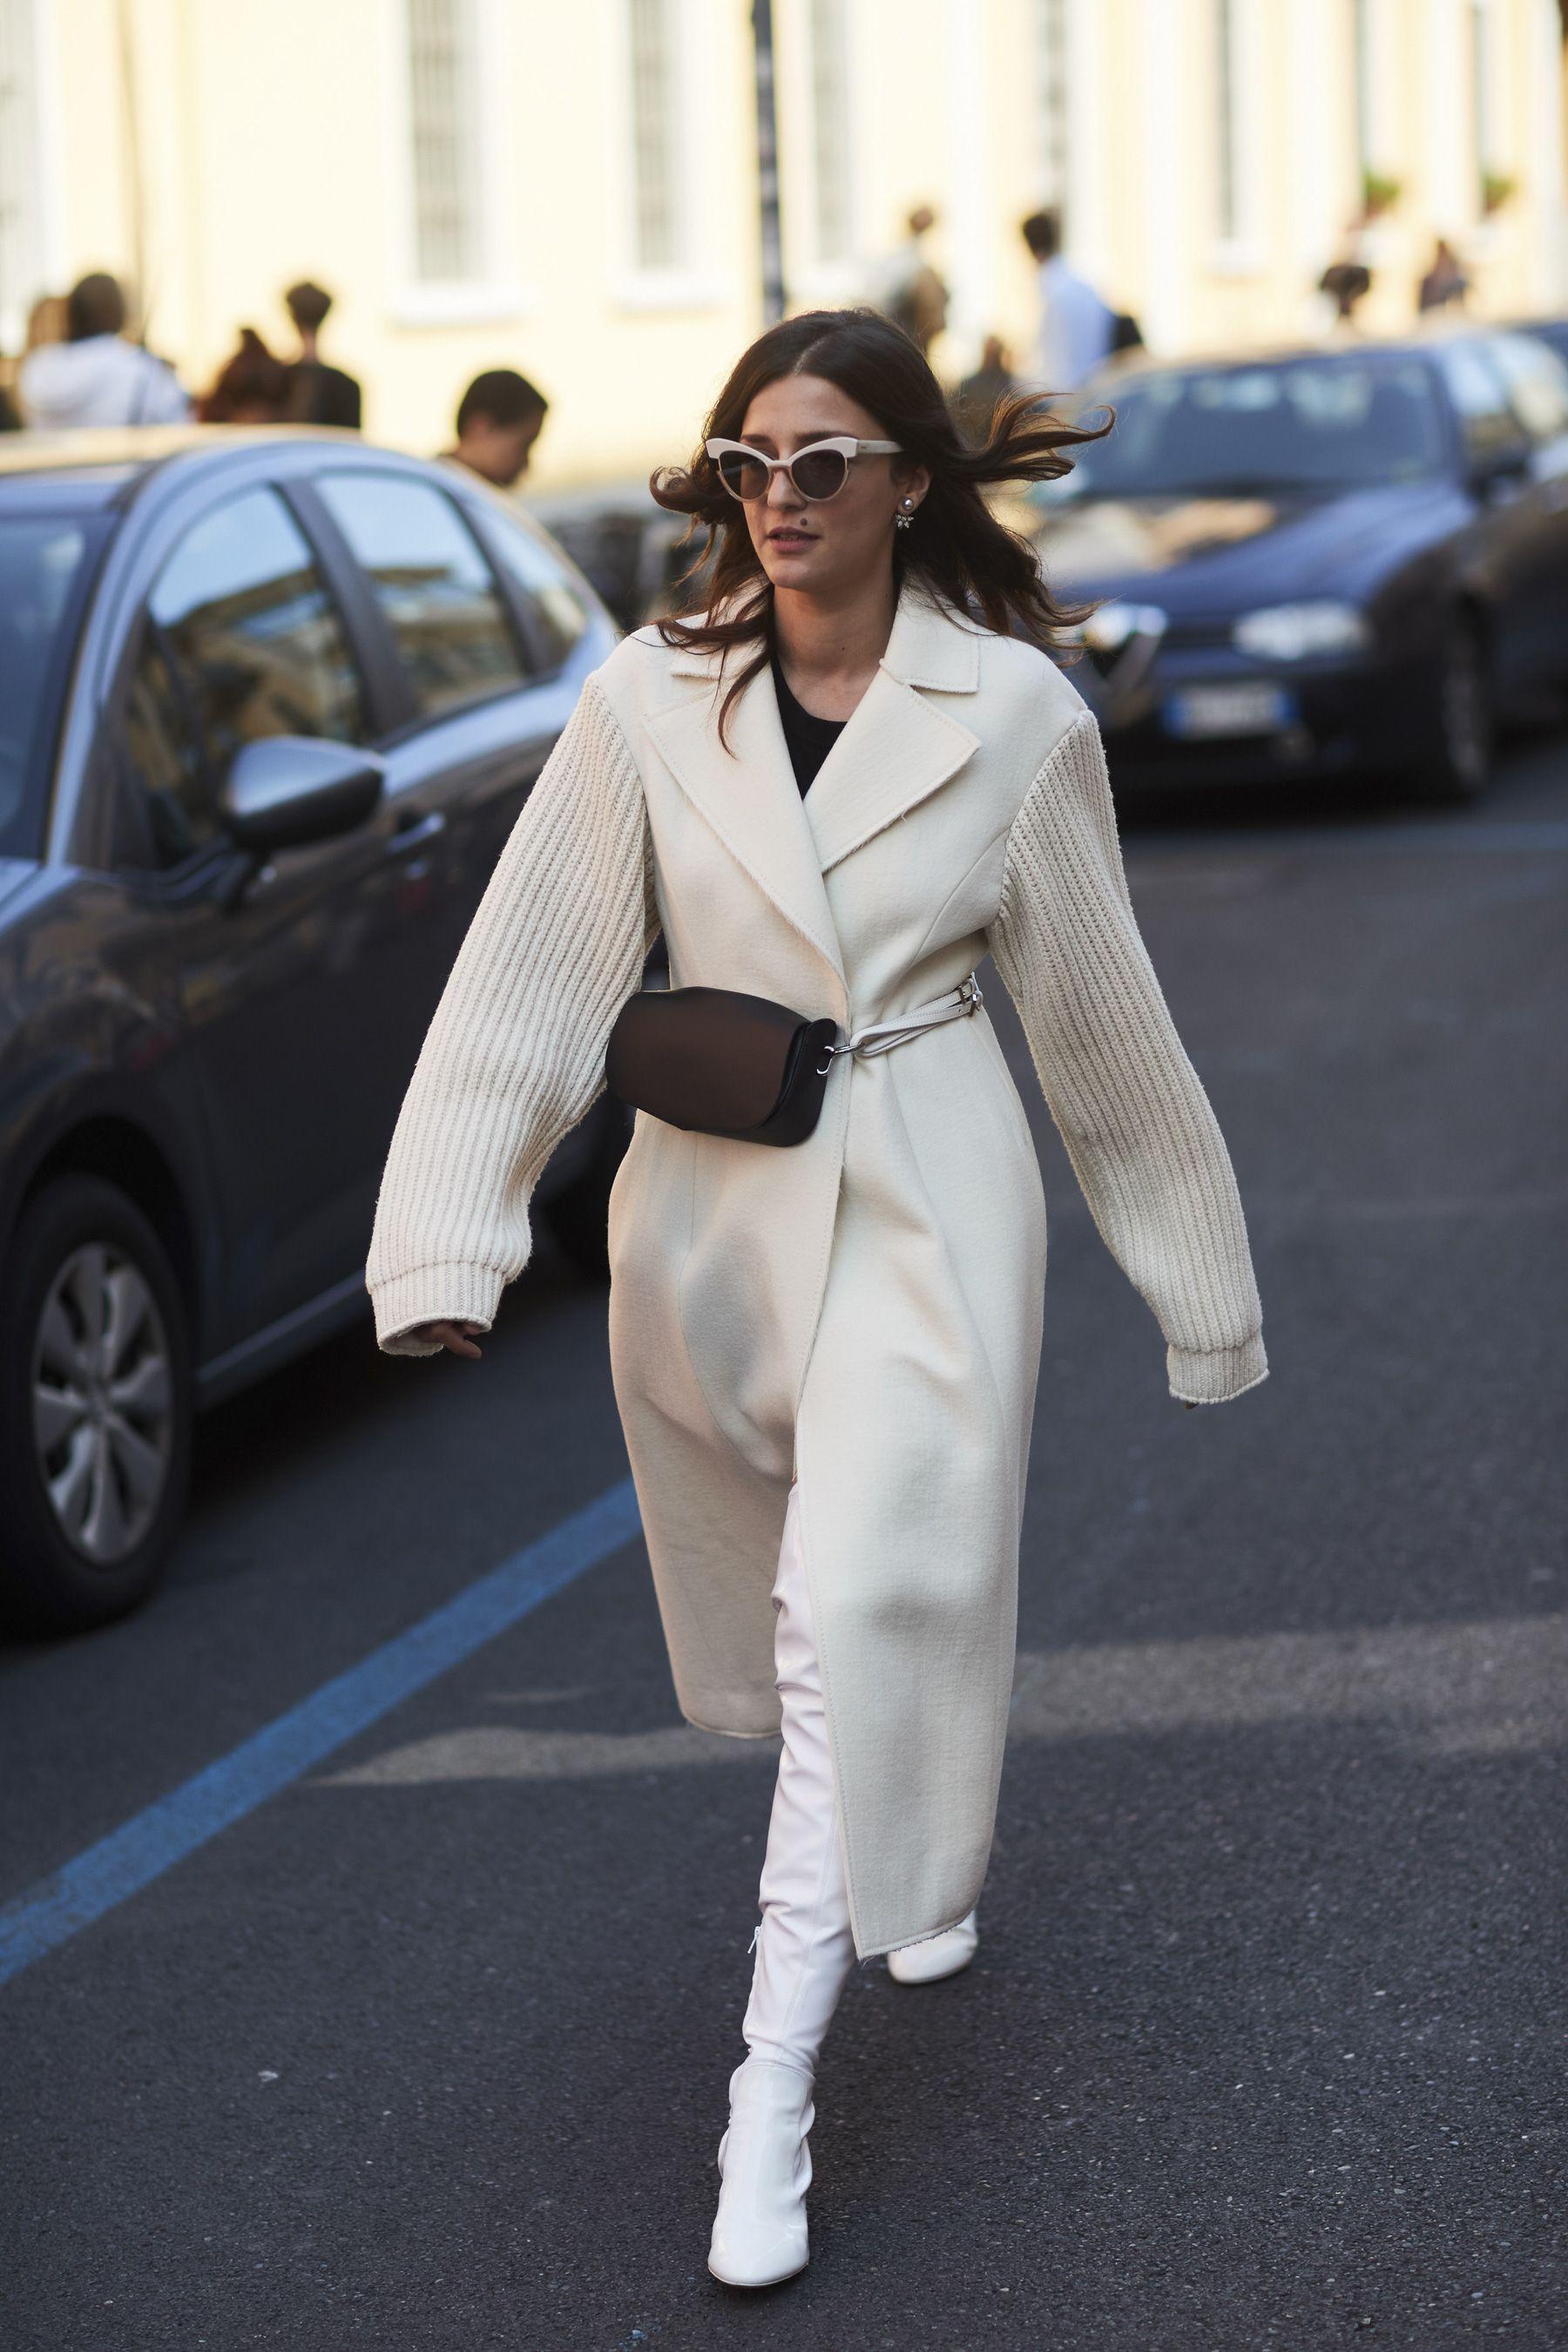 f16d8cd30e0b Milan Fashion Week Street Style Spring 2018 Day 3 Cont.